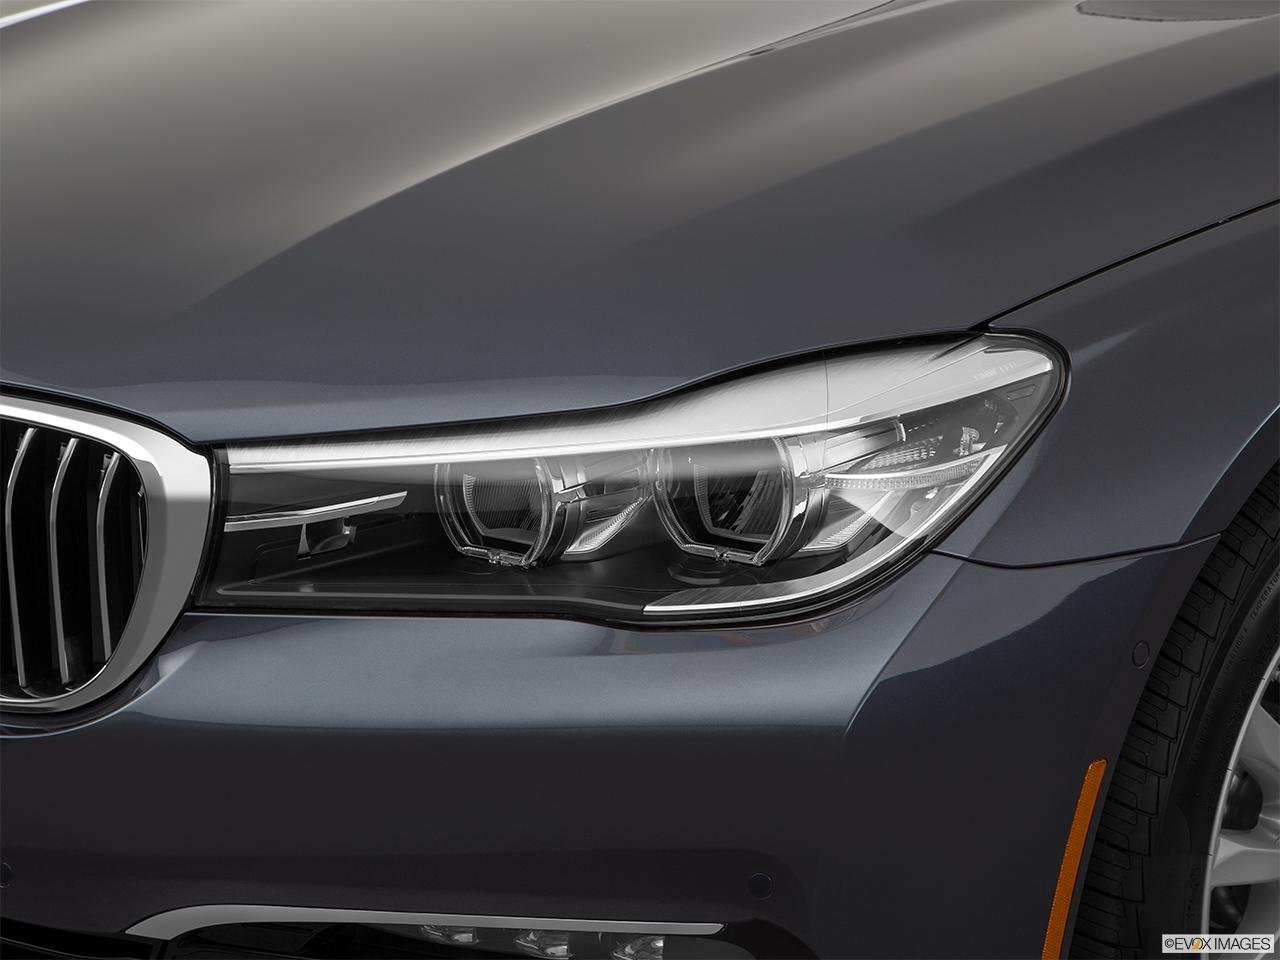 Bmw 7 Series 2018 740li In Uae New Car Prices Specs Reviews Amp 2011 Review Bahrain